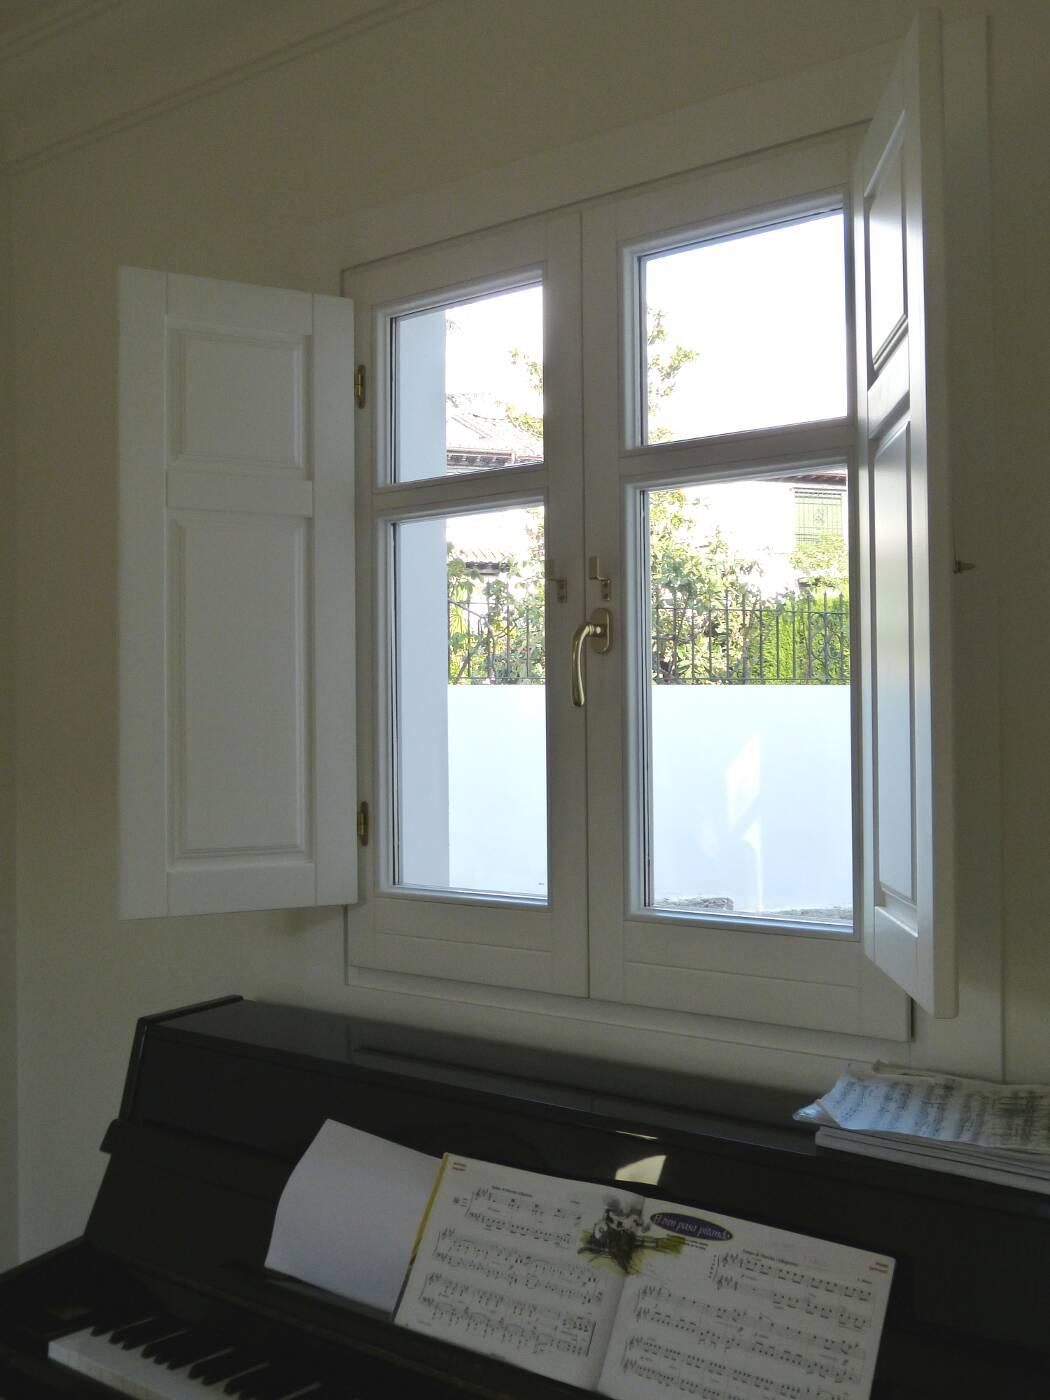 ventanas de madera antiguas cerramientos a medida conely